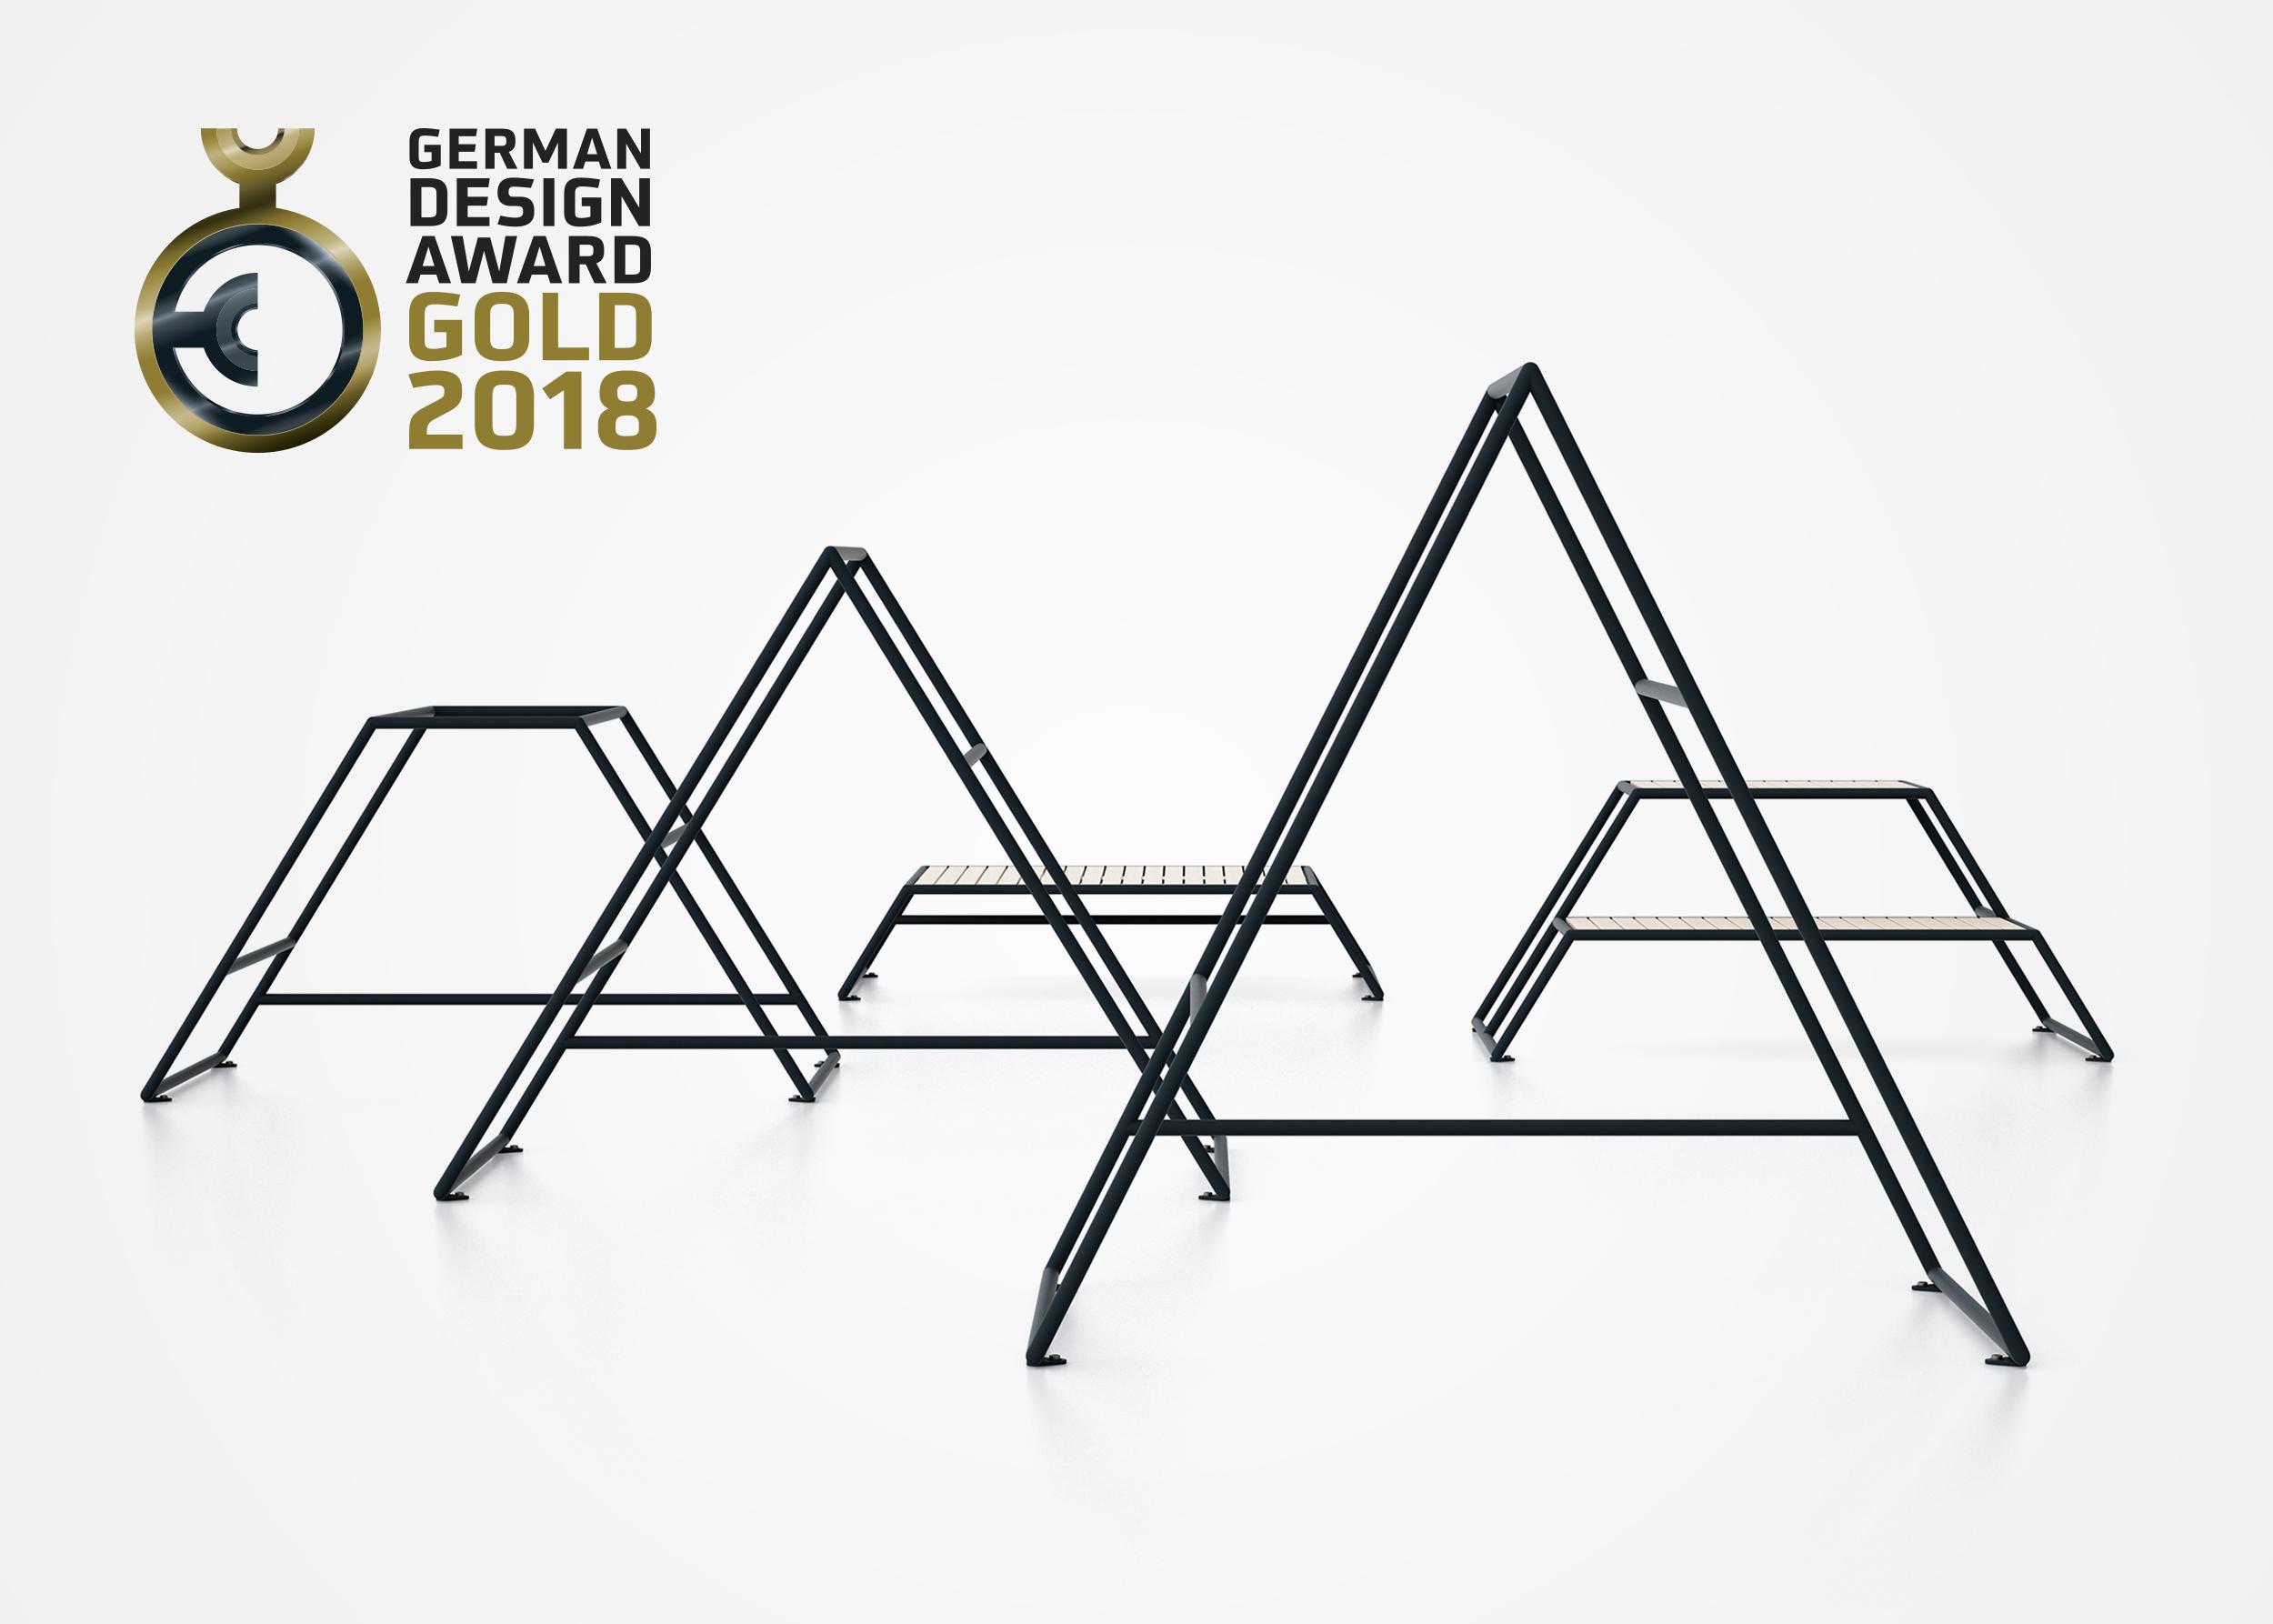 Kebne by Nola Industrier, design Kauppi & Kauppi. Gold winner, German Design Award 2018.